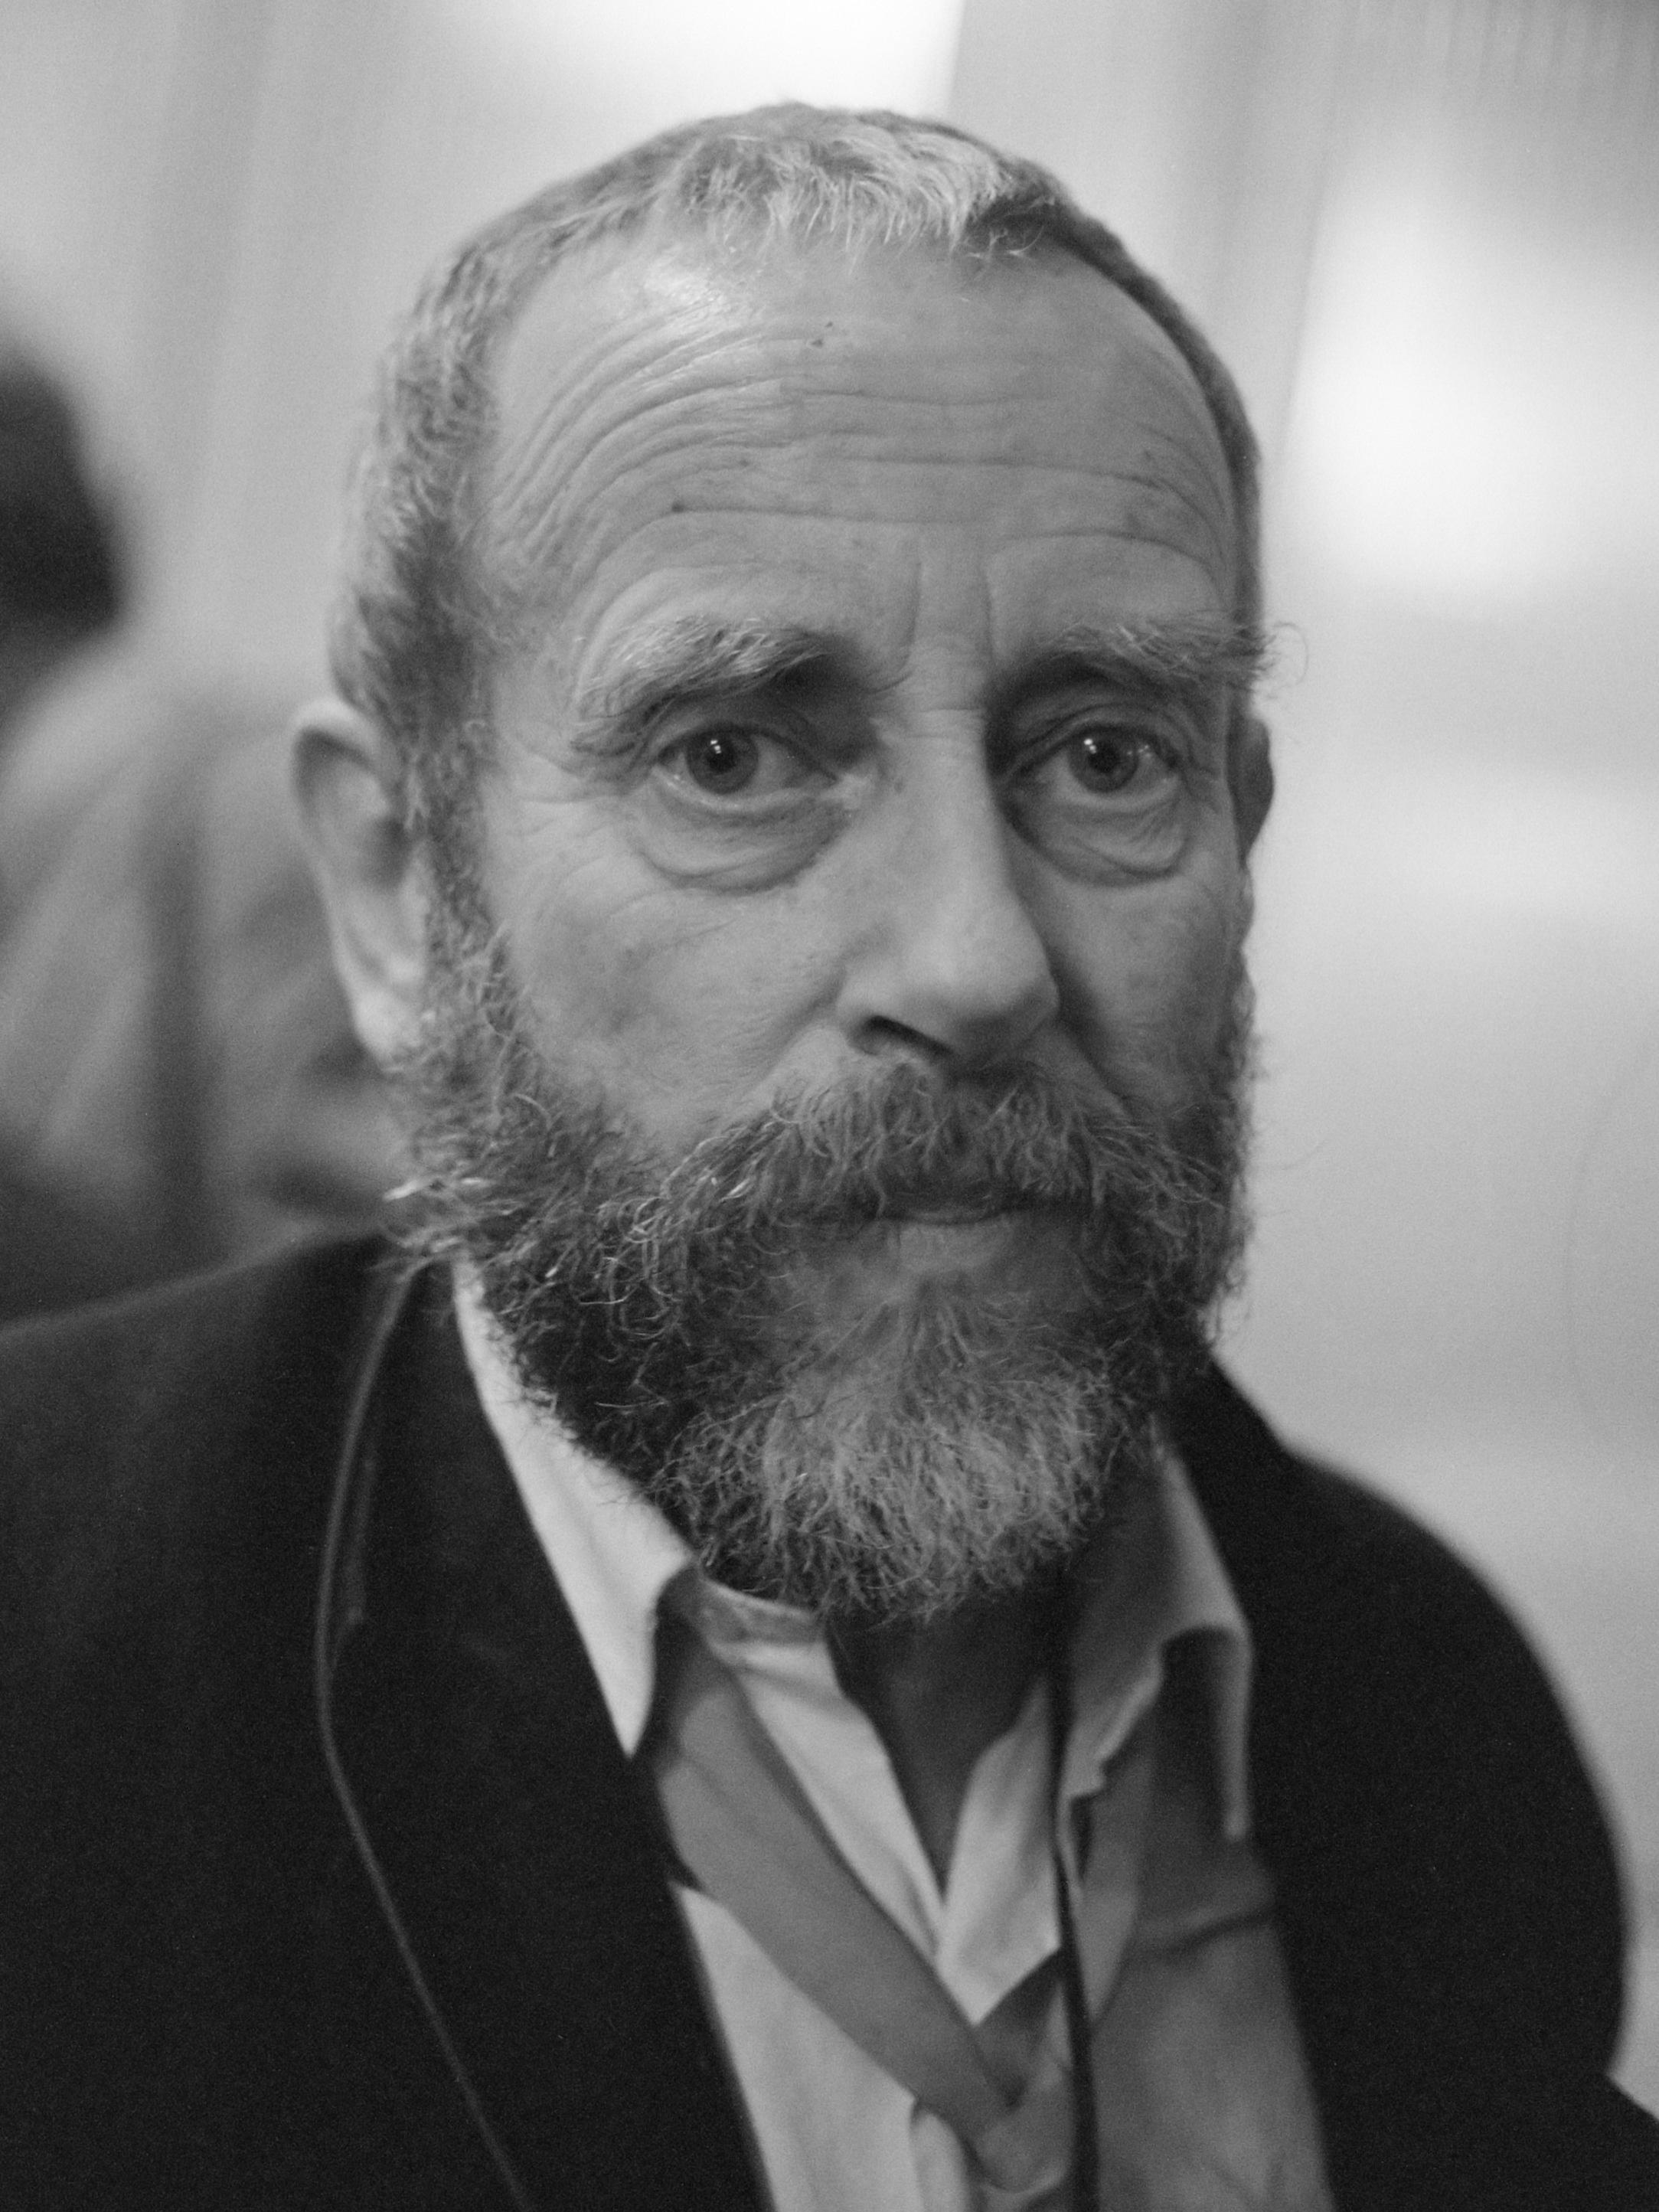 Image of Eduard Van Der Elsken from Wikidata